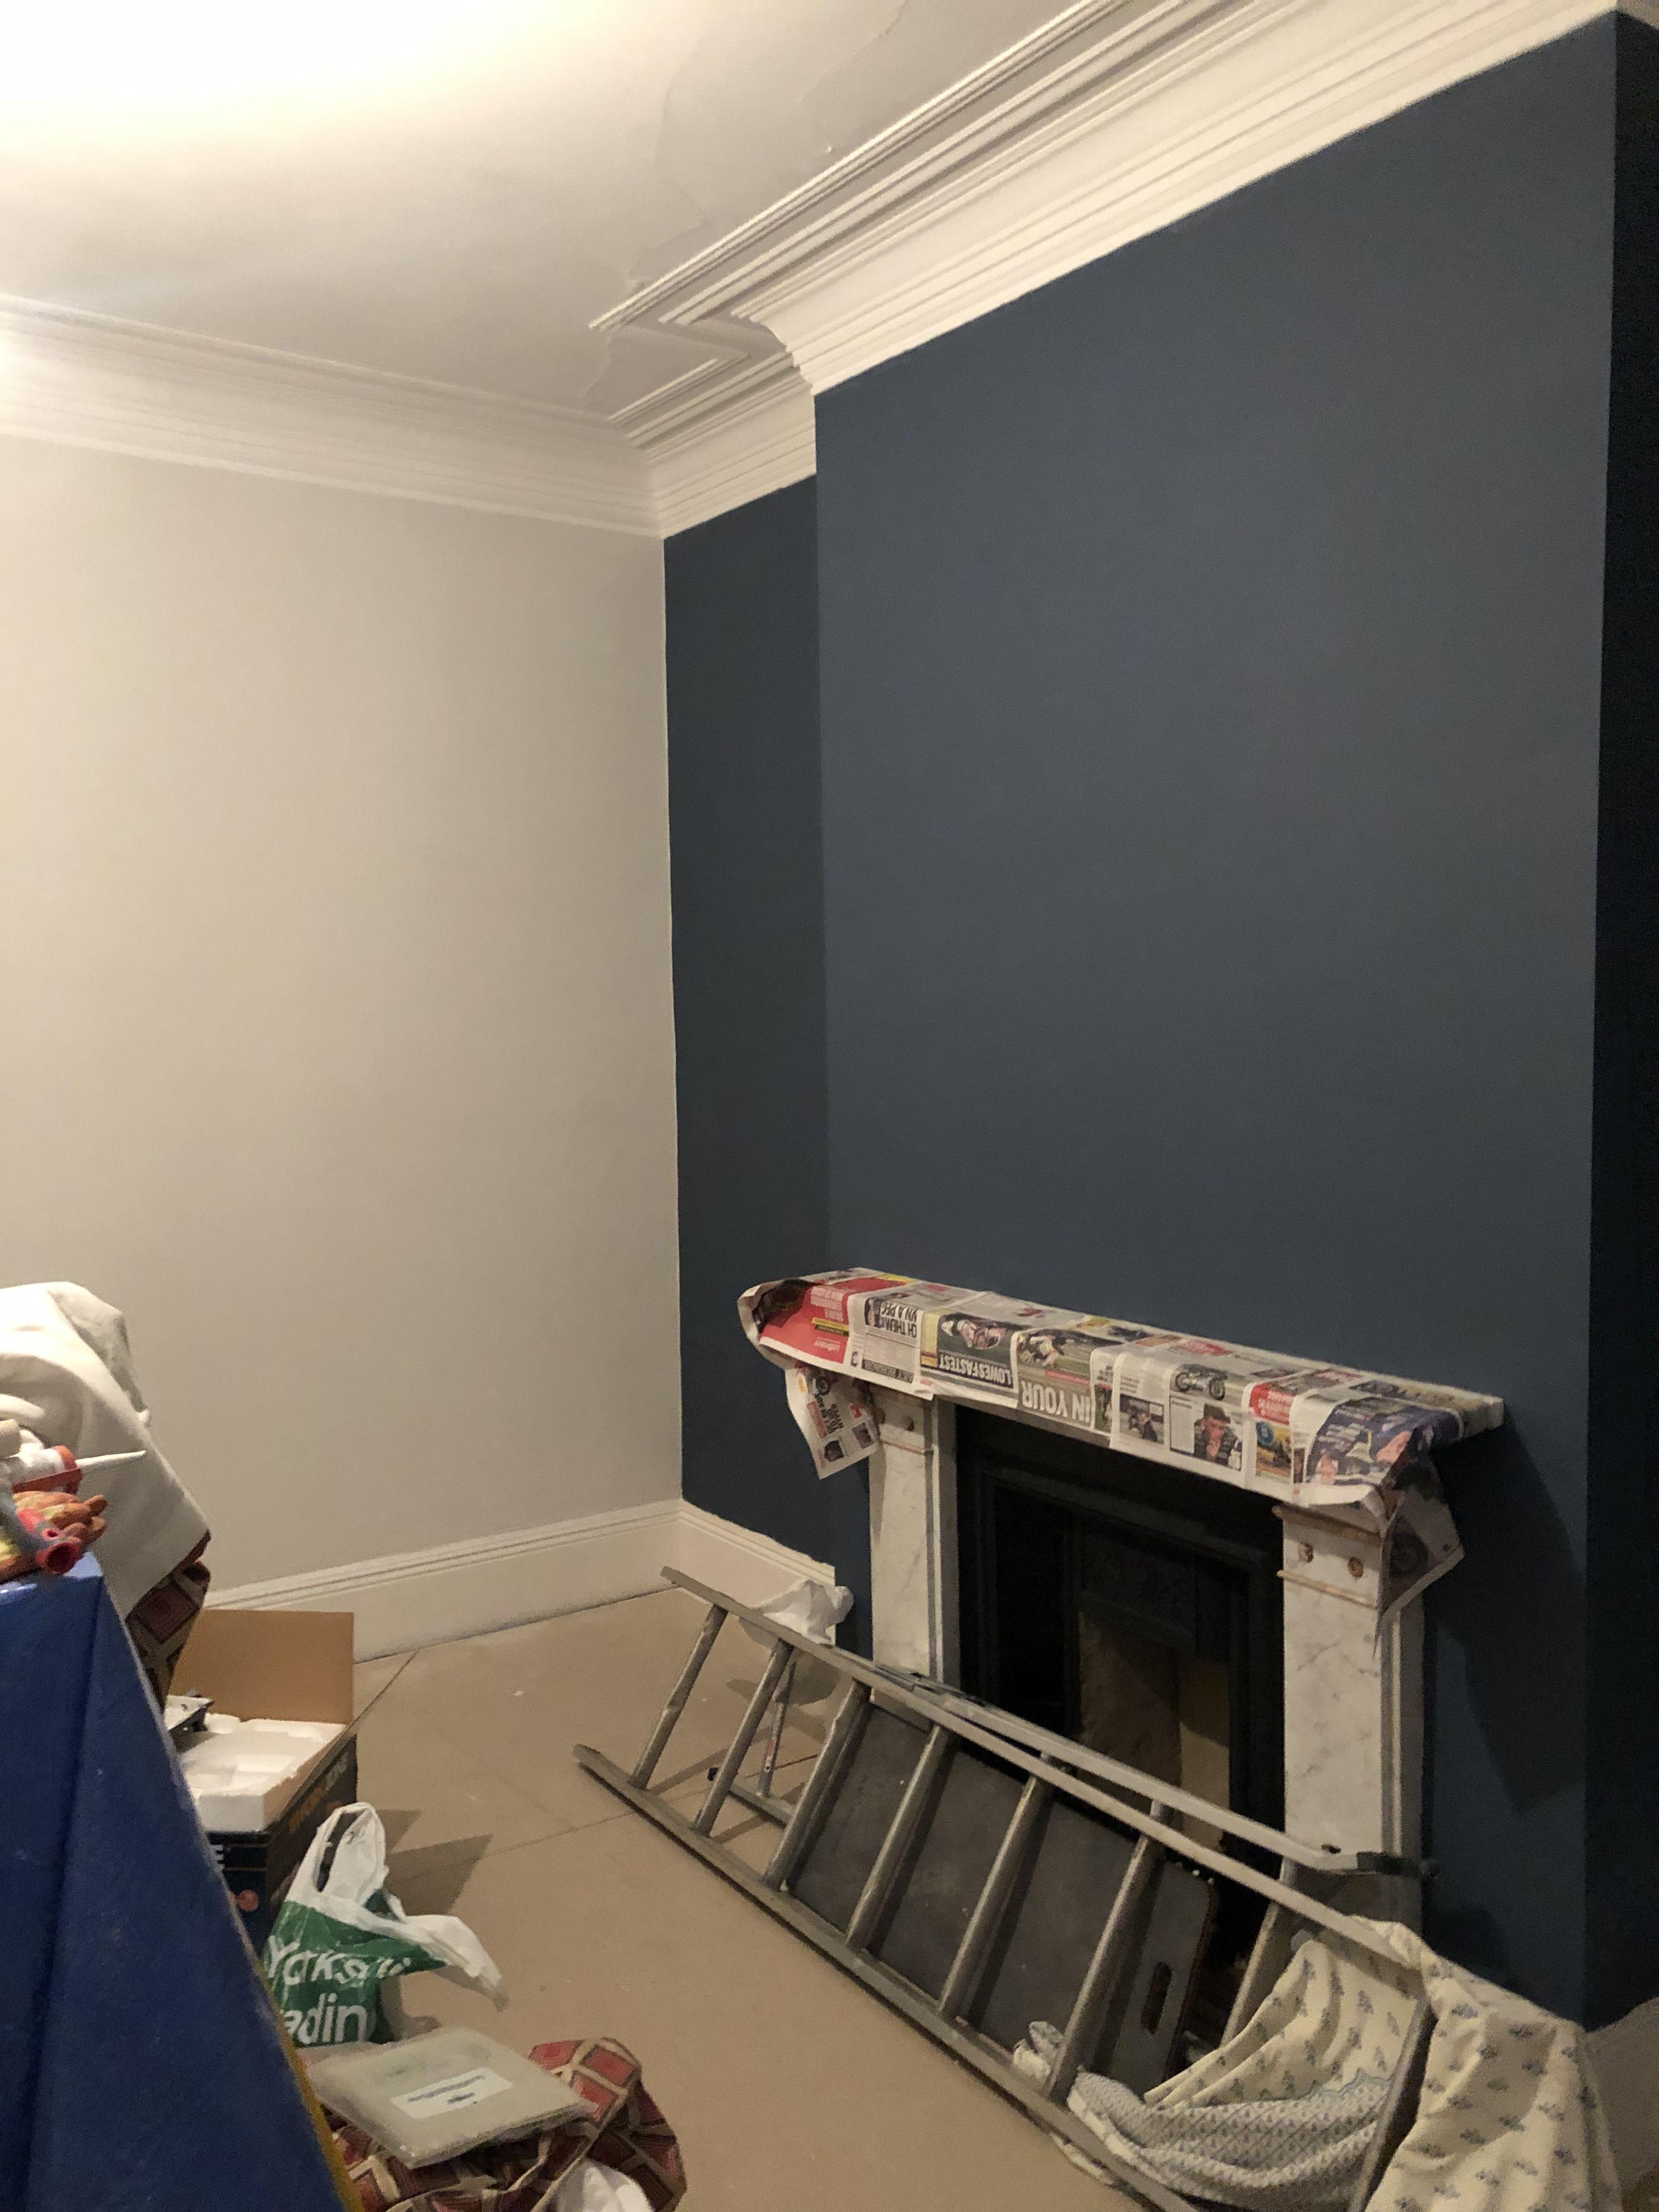 Stiffkey blue and amonite grey living room farrow and ball ...